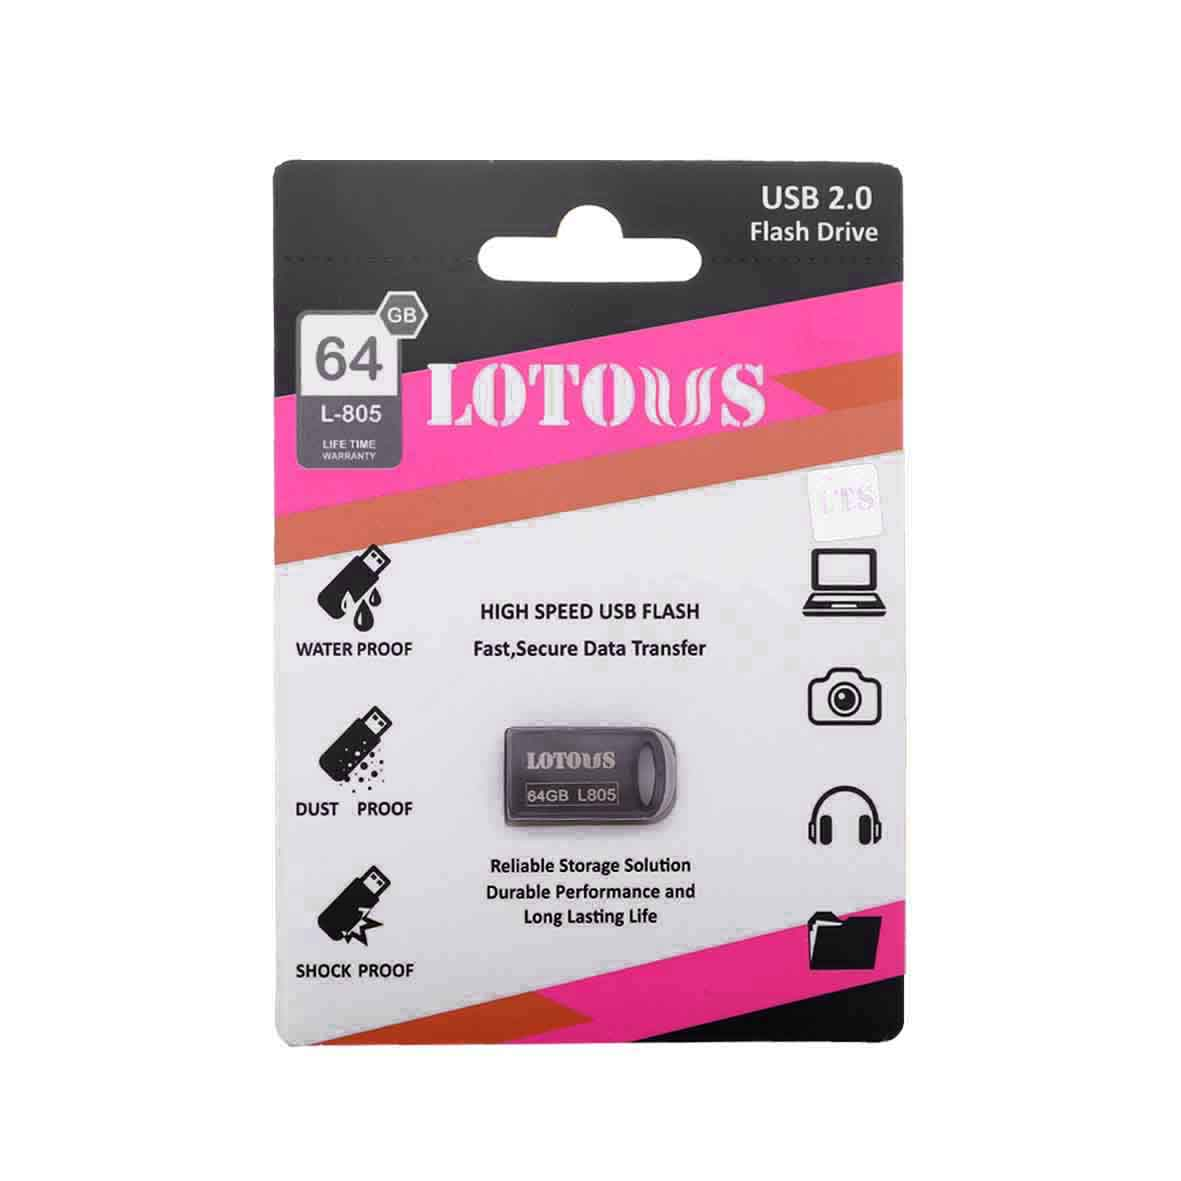 main images فلش مموری LOTOUS مدل USB2 L805 حافظه 64GB LOTOUS L805 32GB USB2.0 flash memory